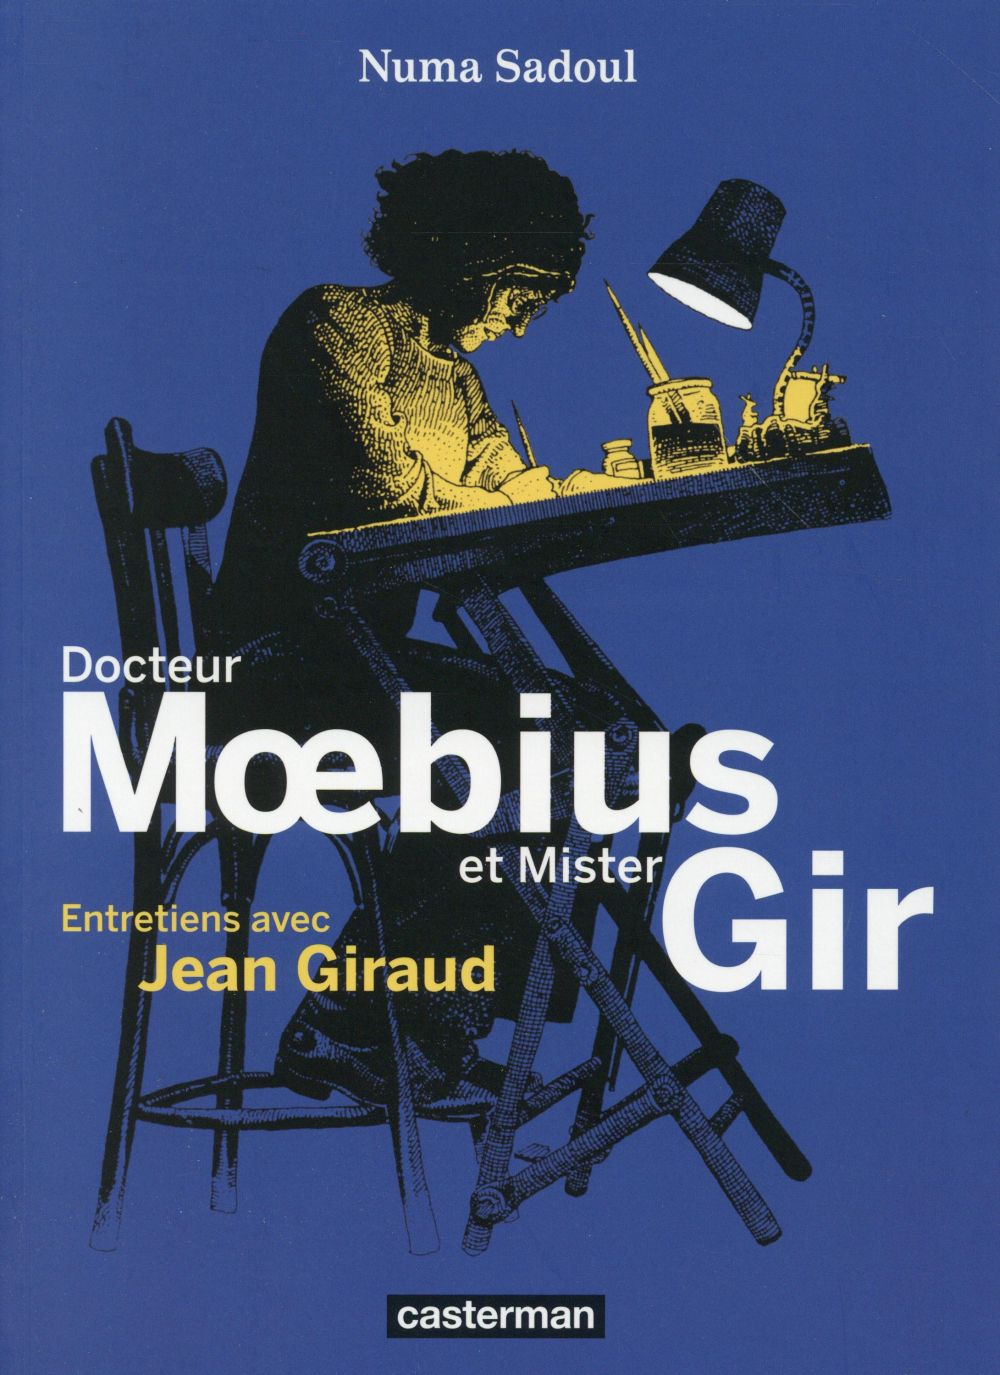 Docteur Moebius et mister Gir ; entretiens avec Jean Giraud